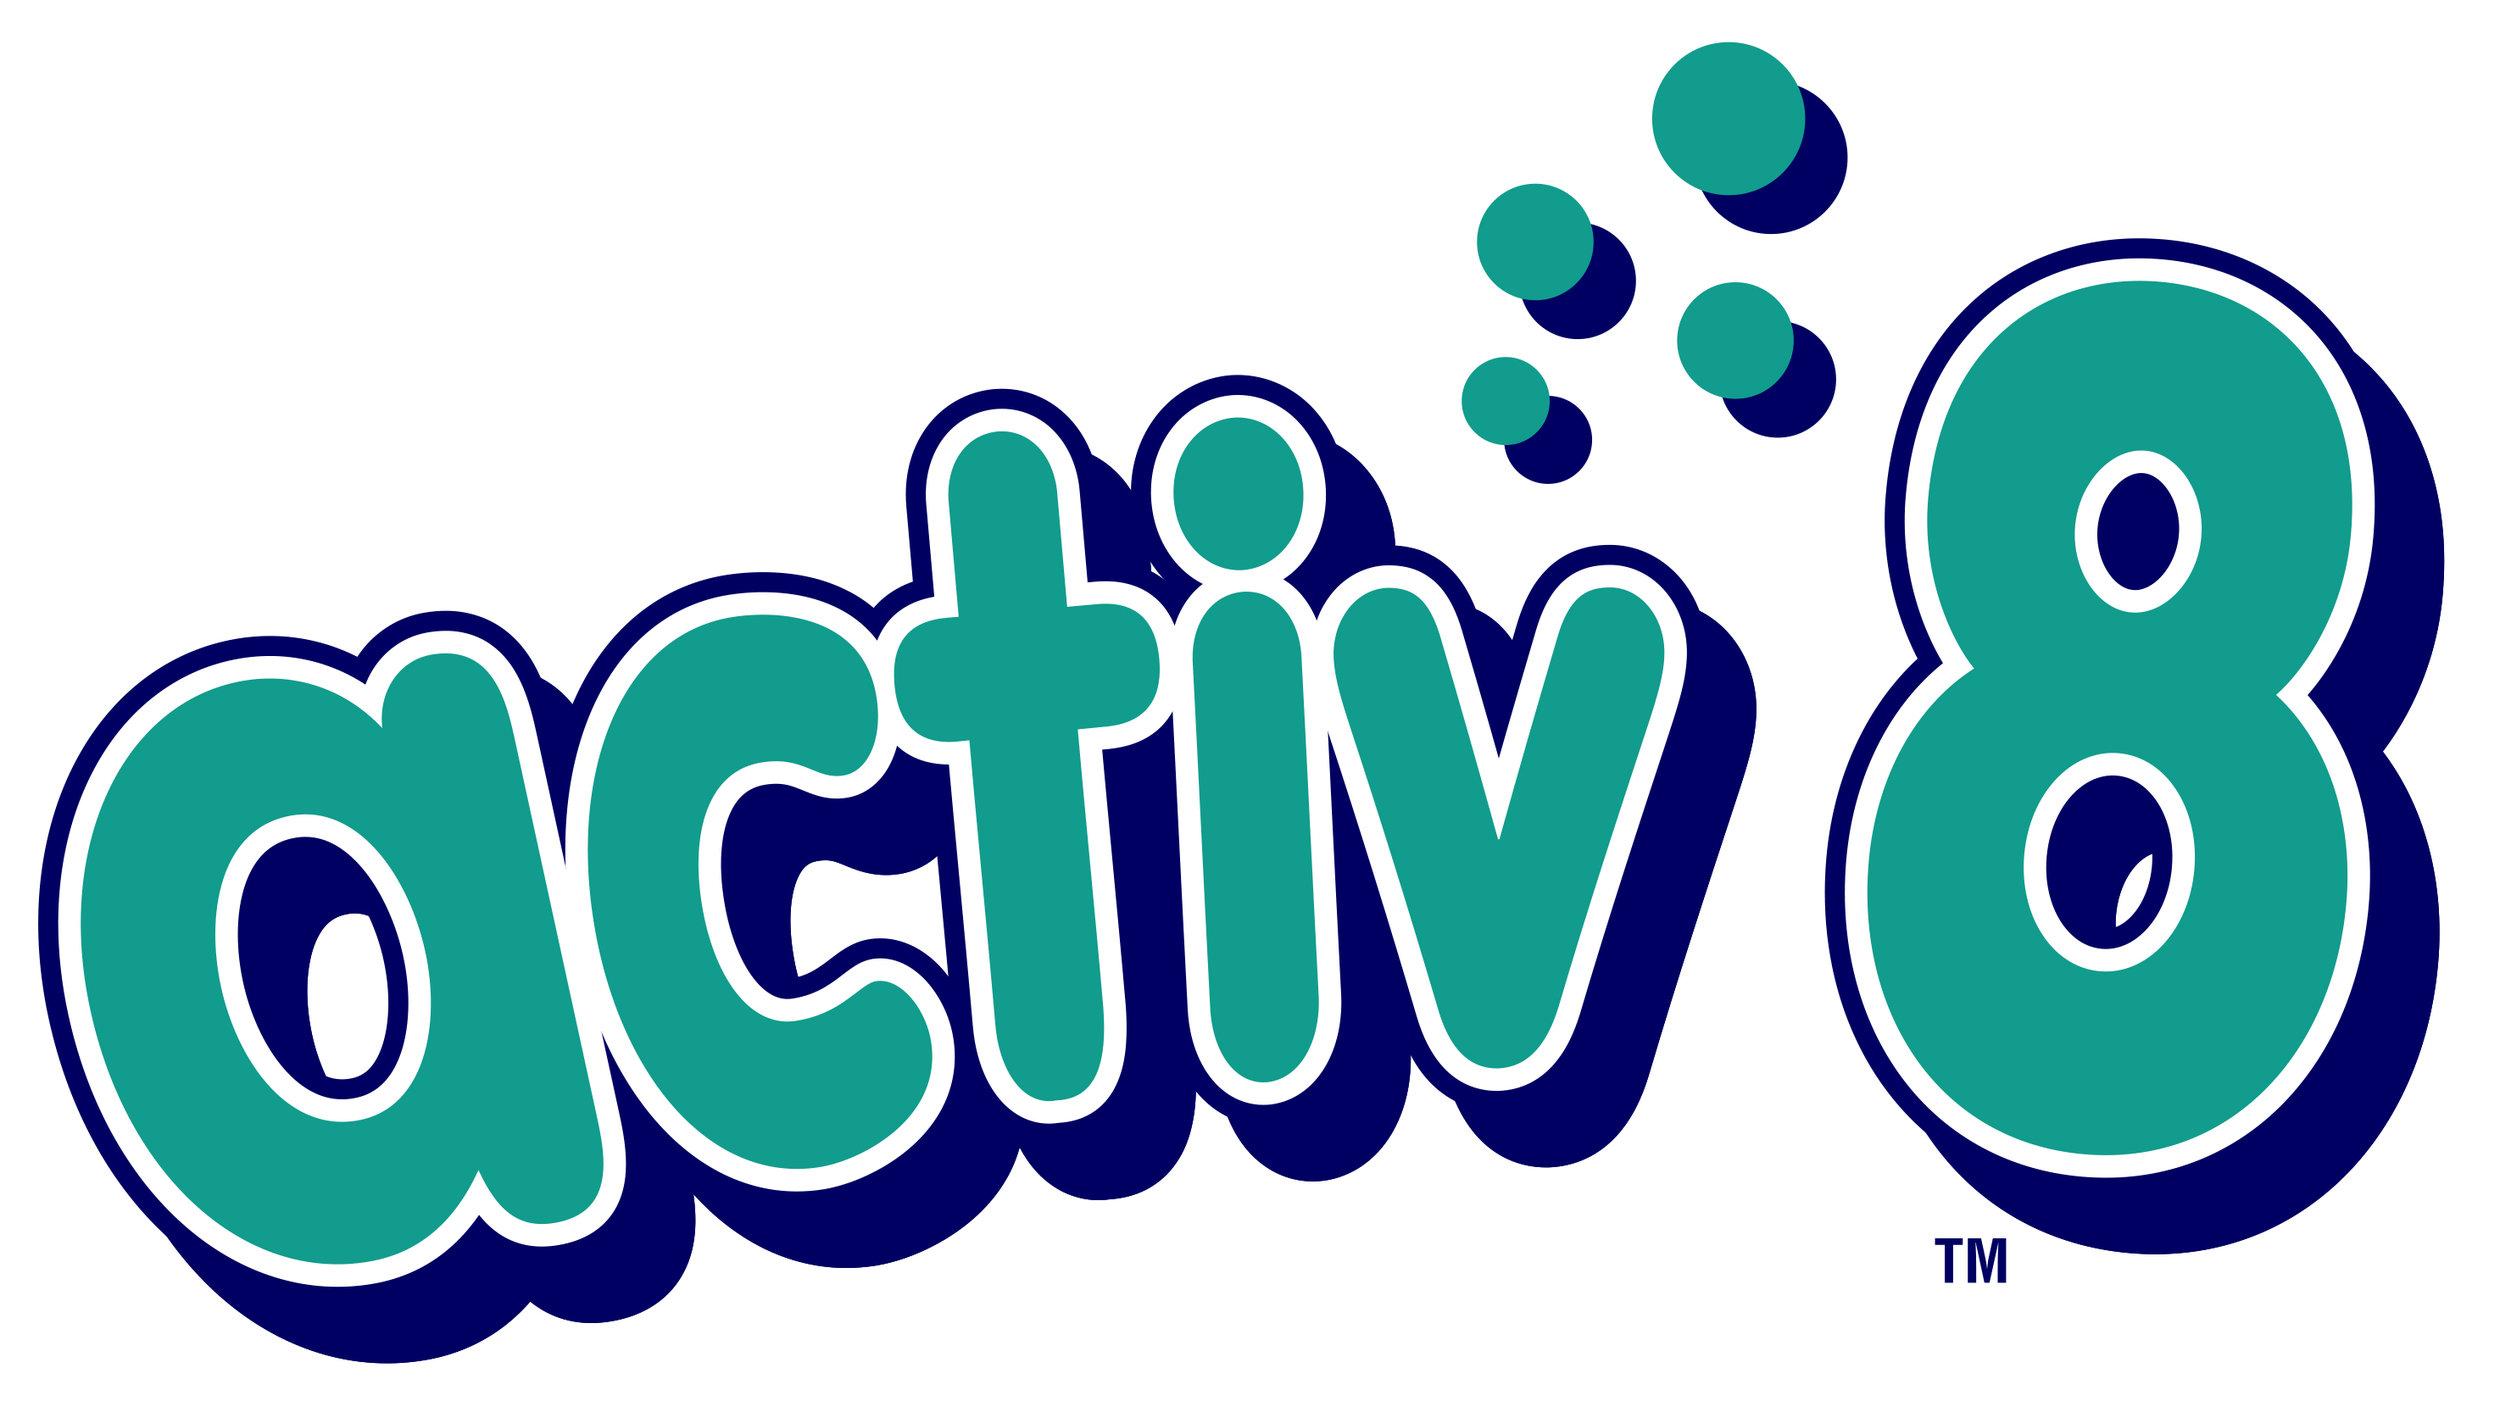 Activ 8 logo.jpg